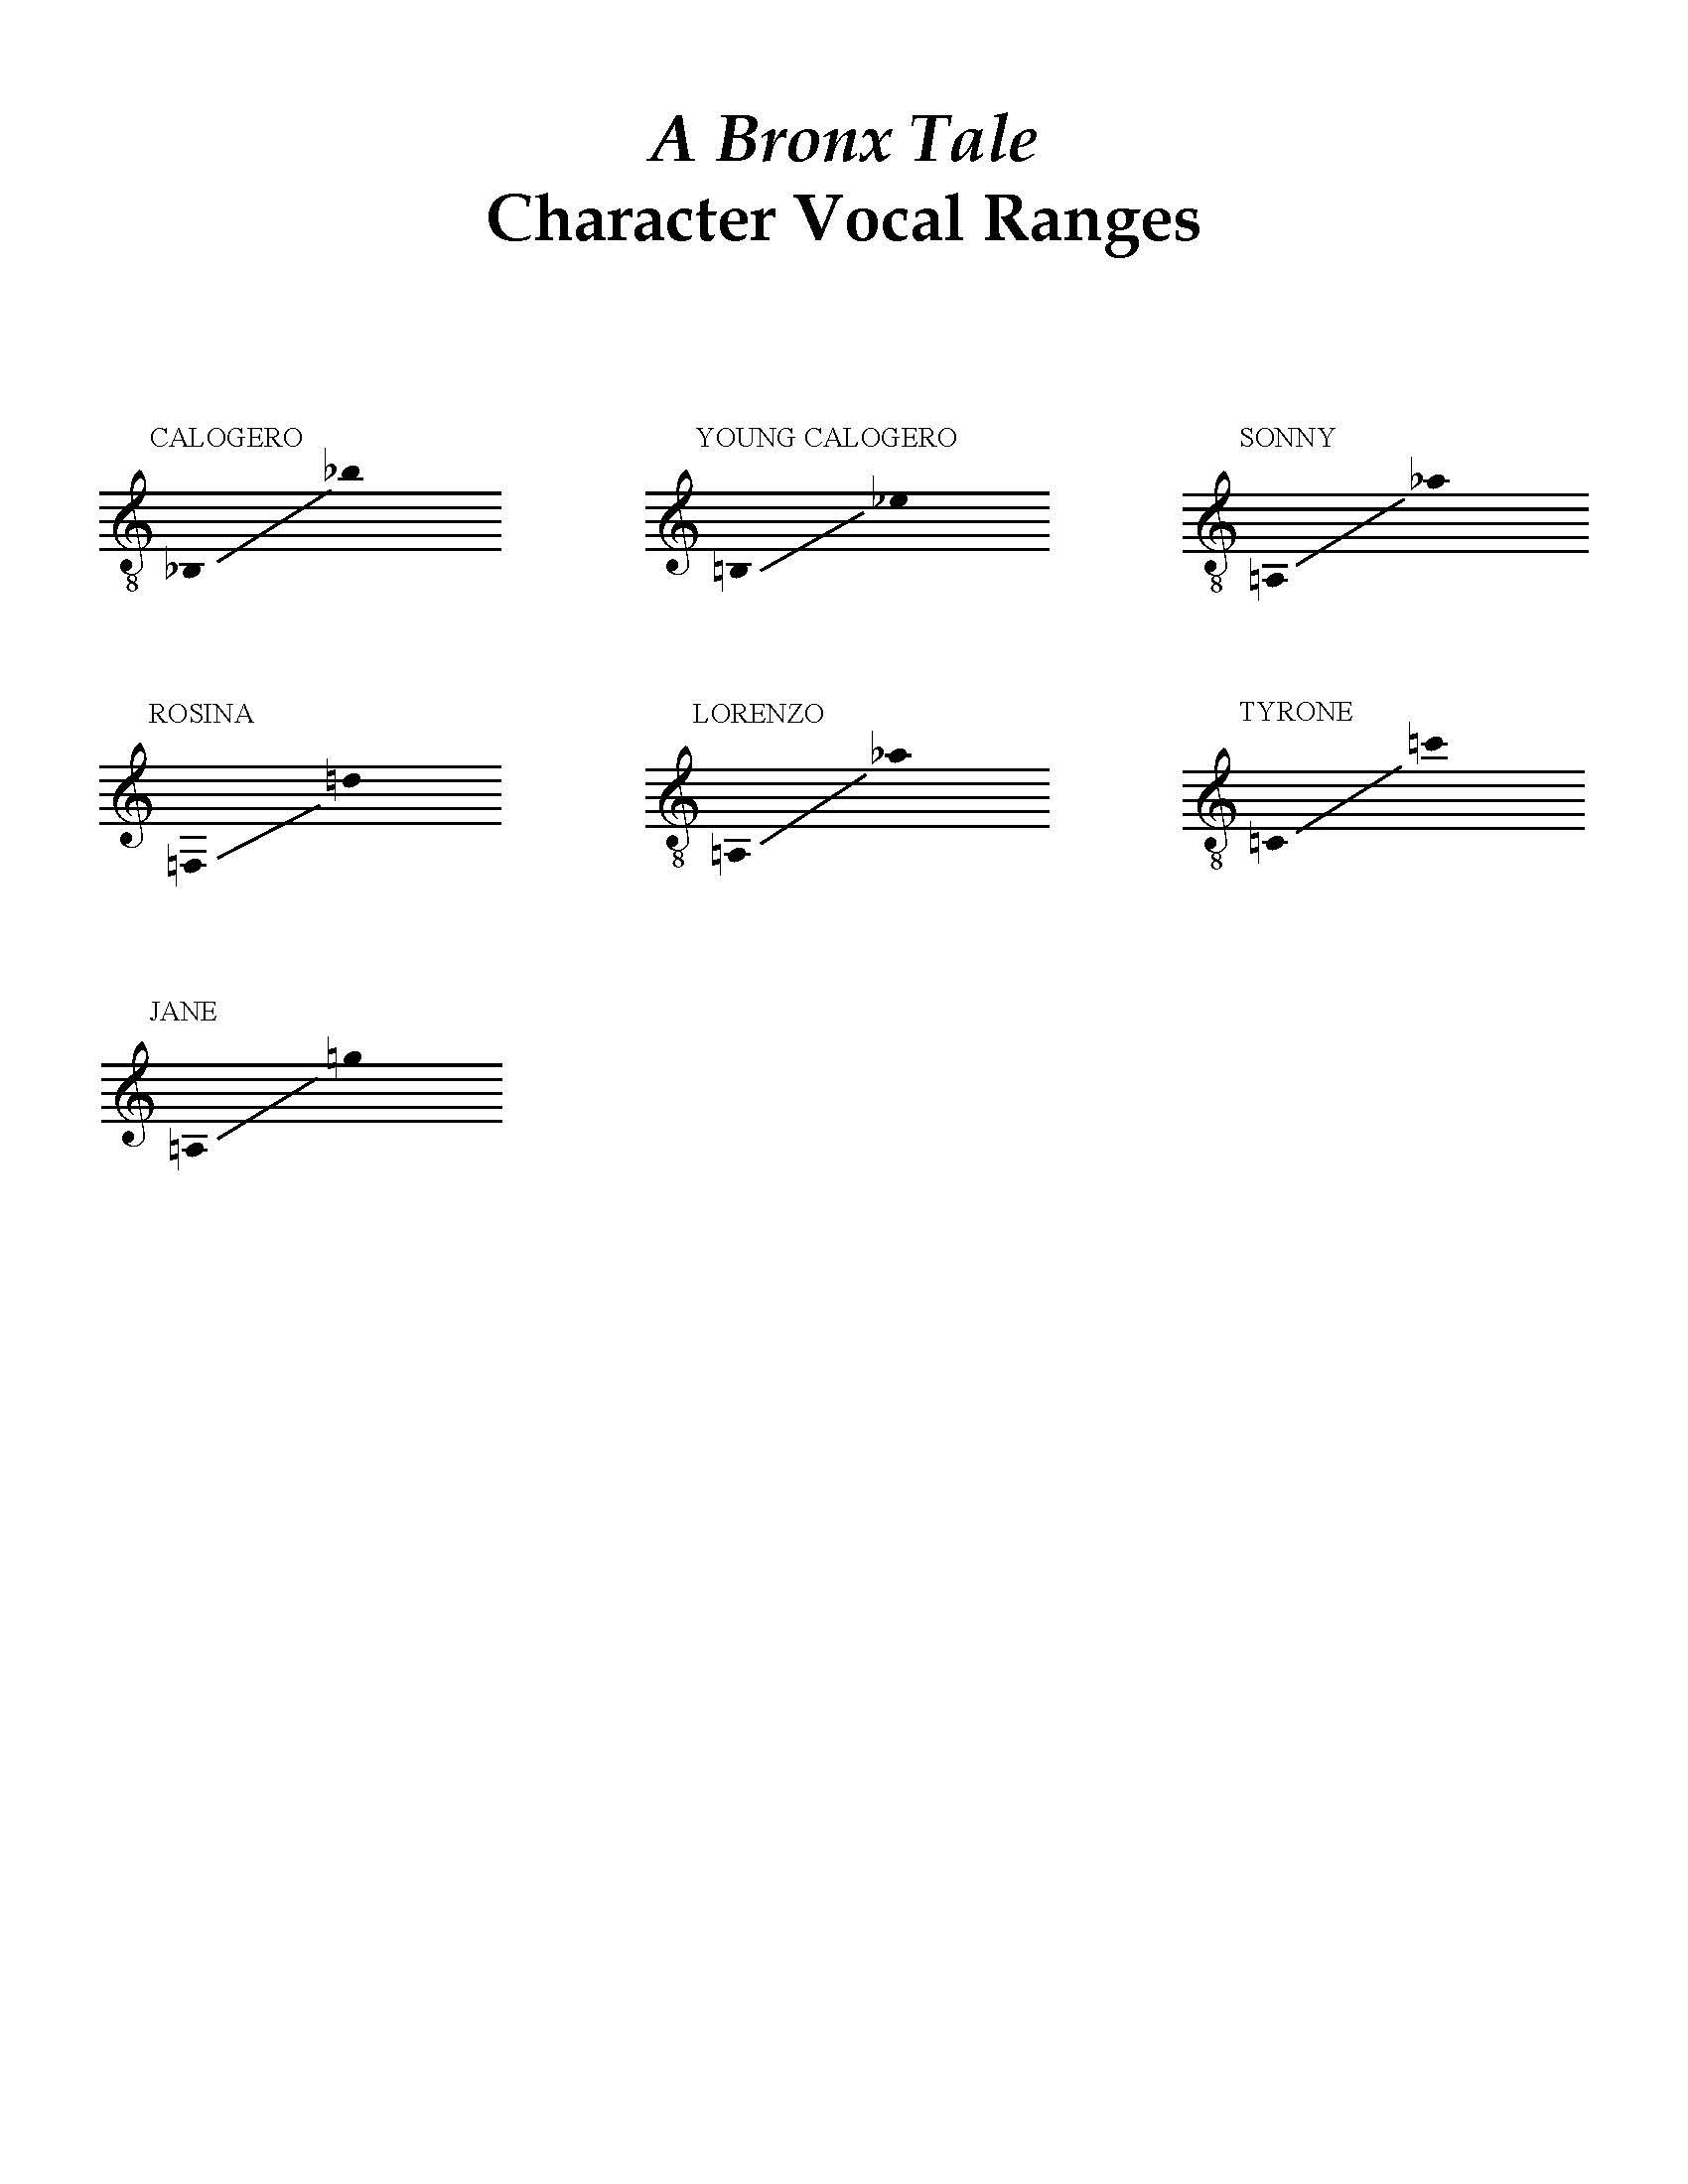 A Bronx Tale Vocal Ranges